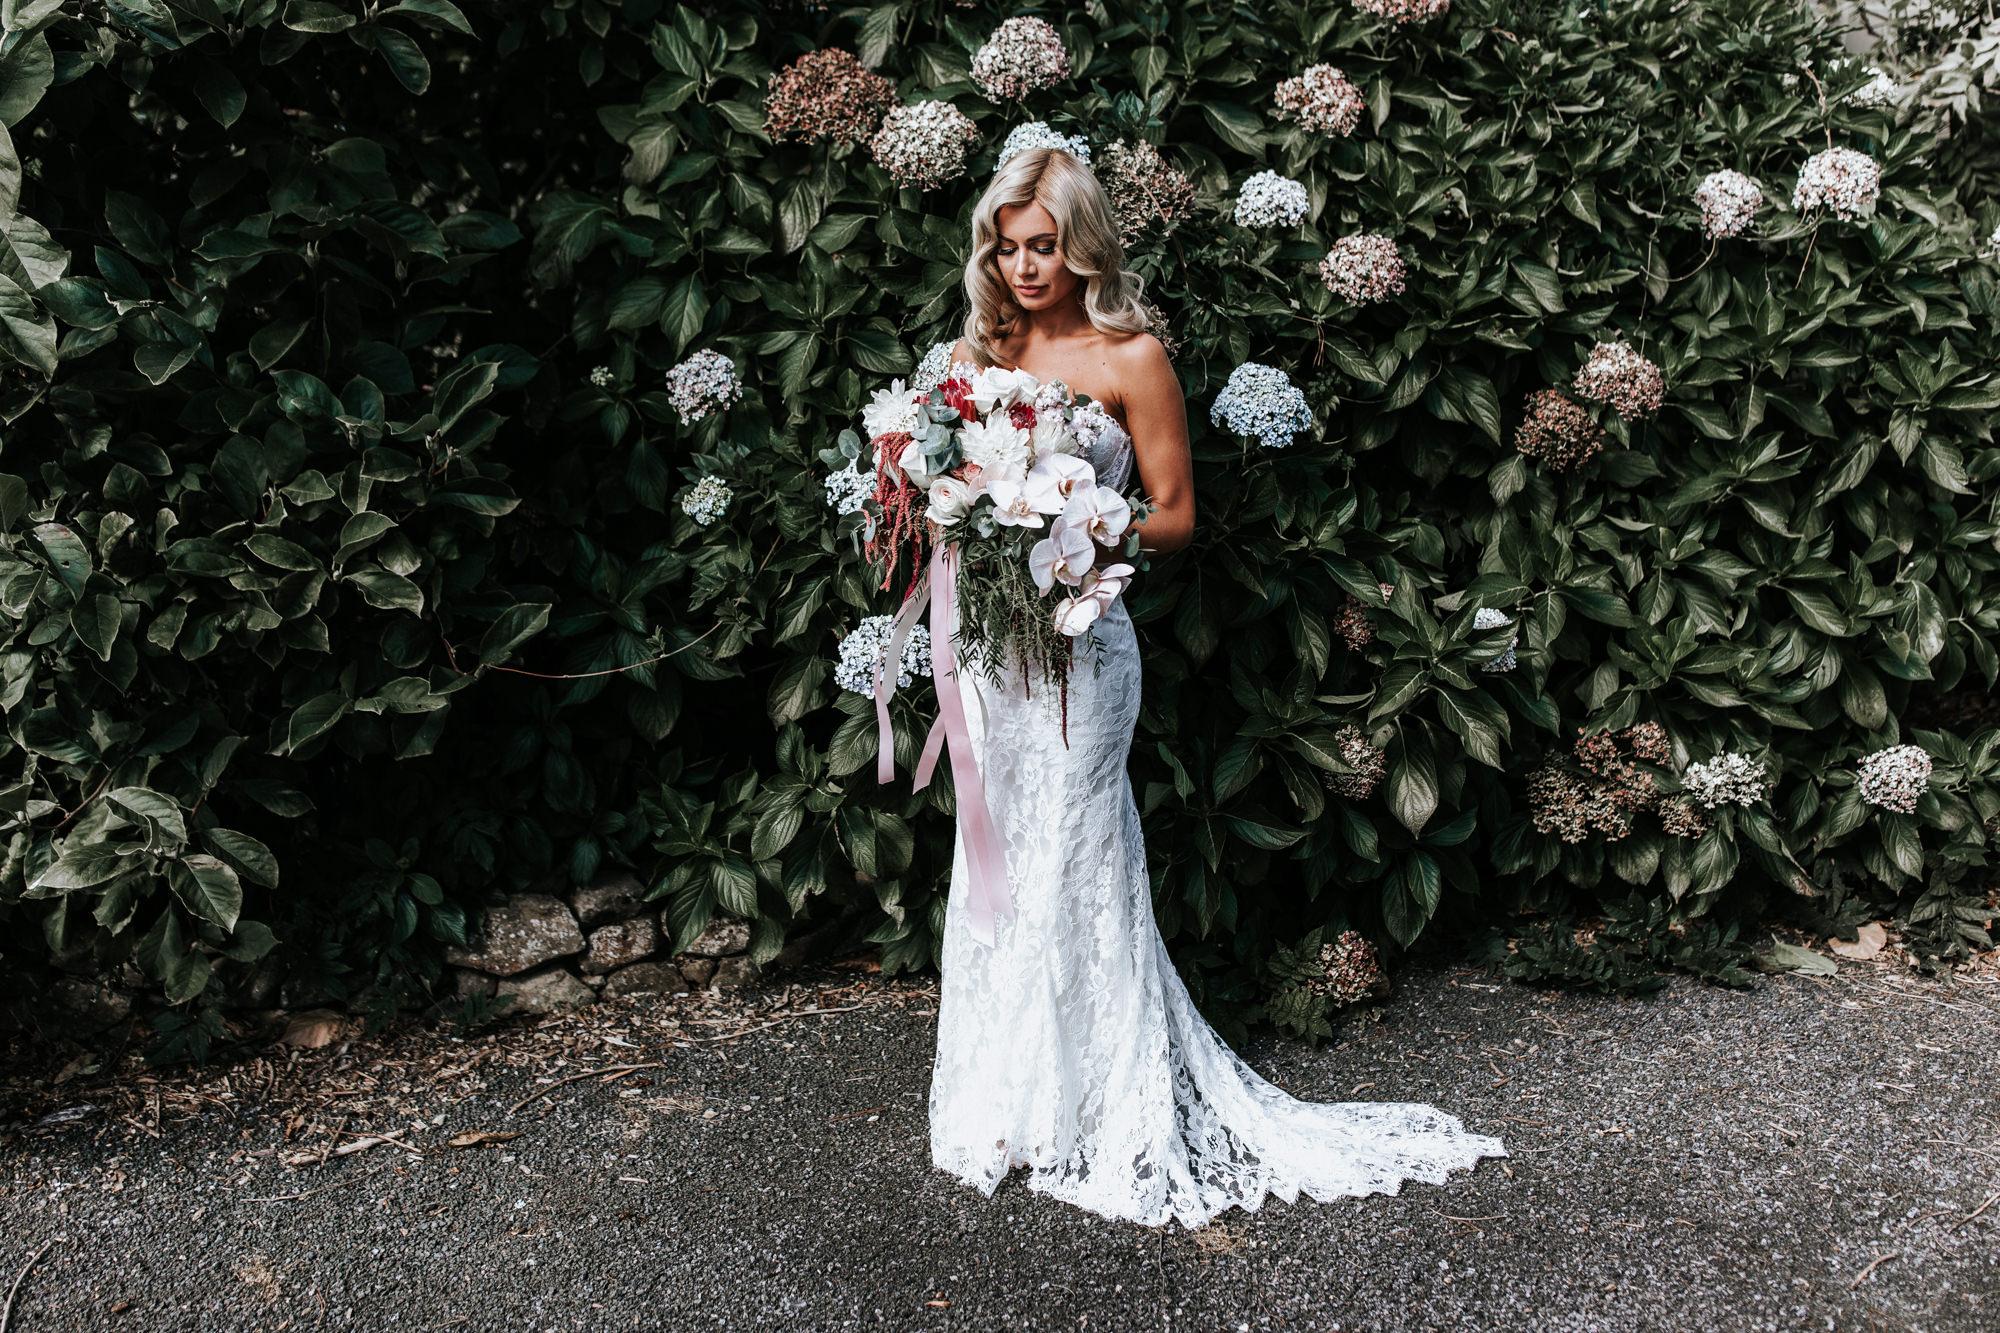 mali-brae-wedding-natalie-scott-baldwin-3.jpg